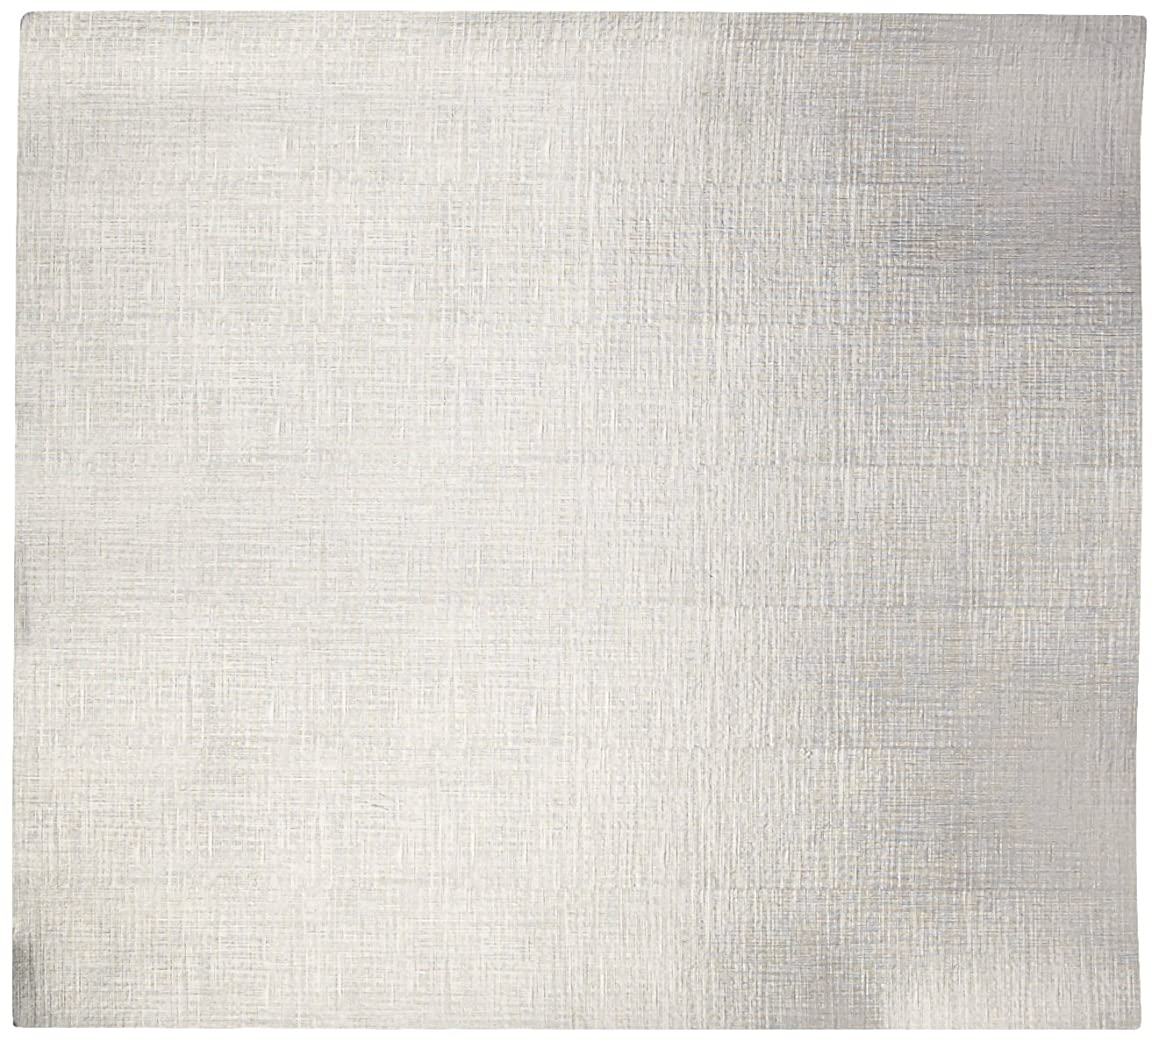 Silver Linen Paper 12